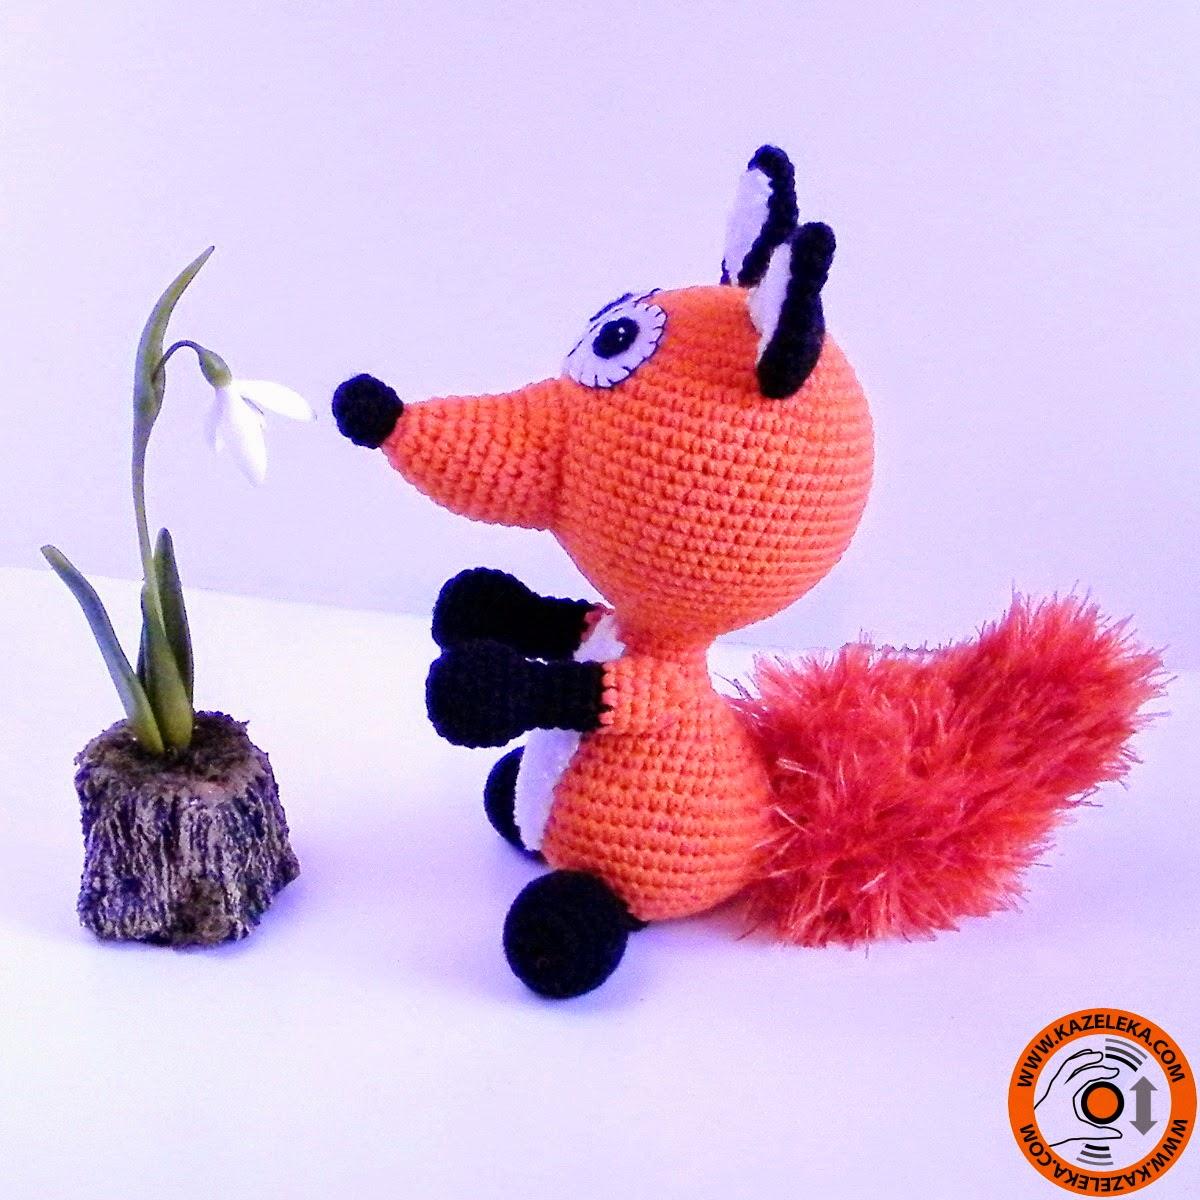 вязаная игрушка лиса